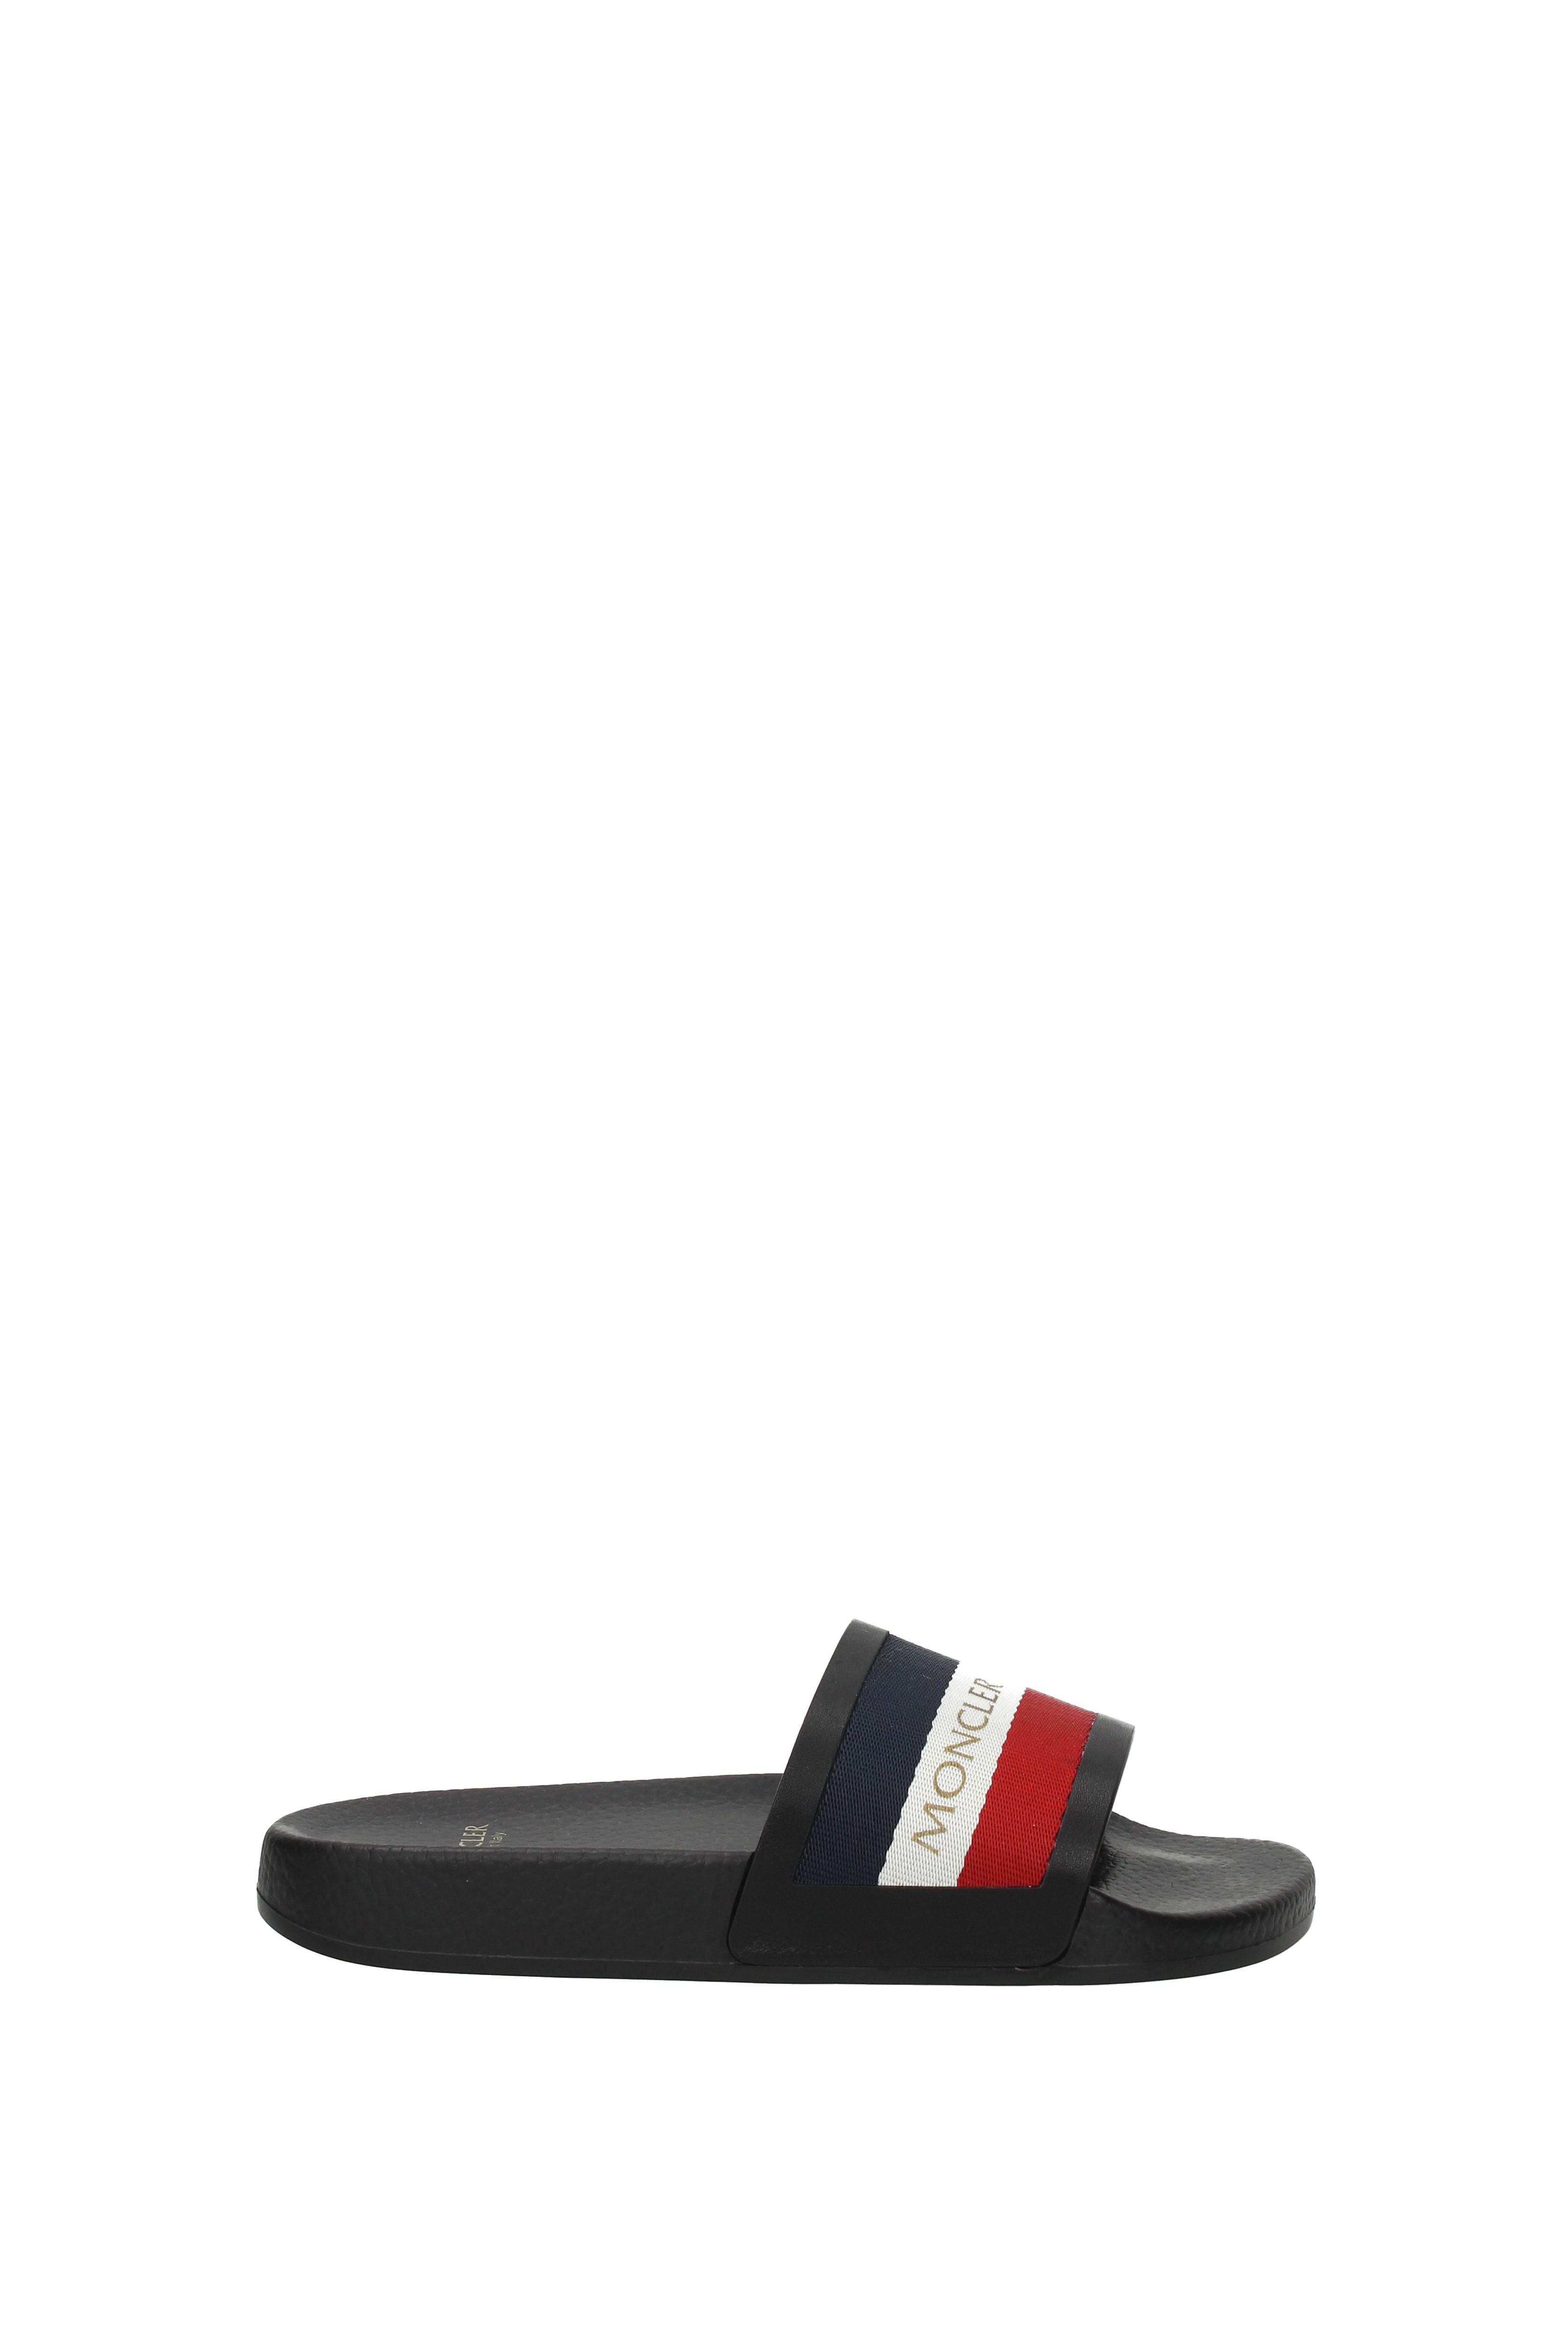 Flip-Flops-und-Holzschuhe-Moncler-Damen-Stoff-202050001878